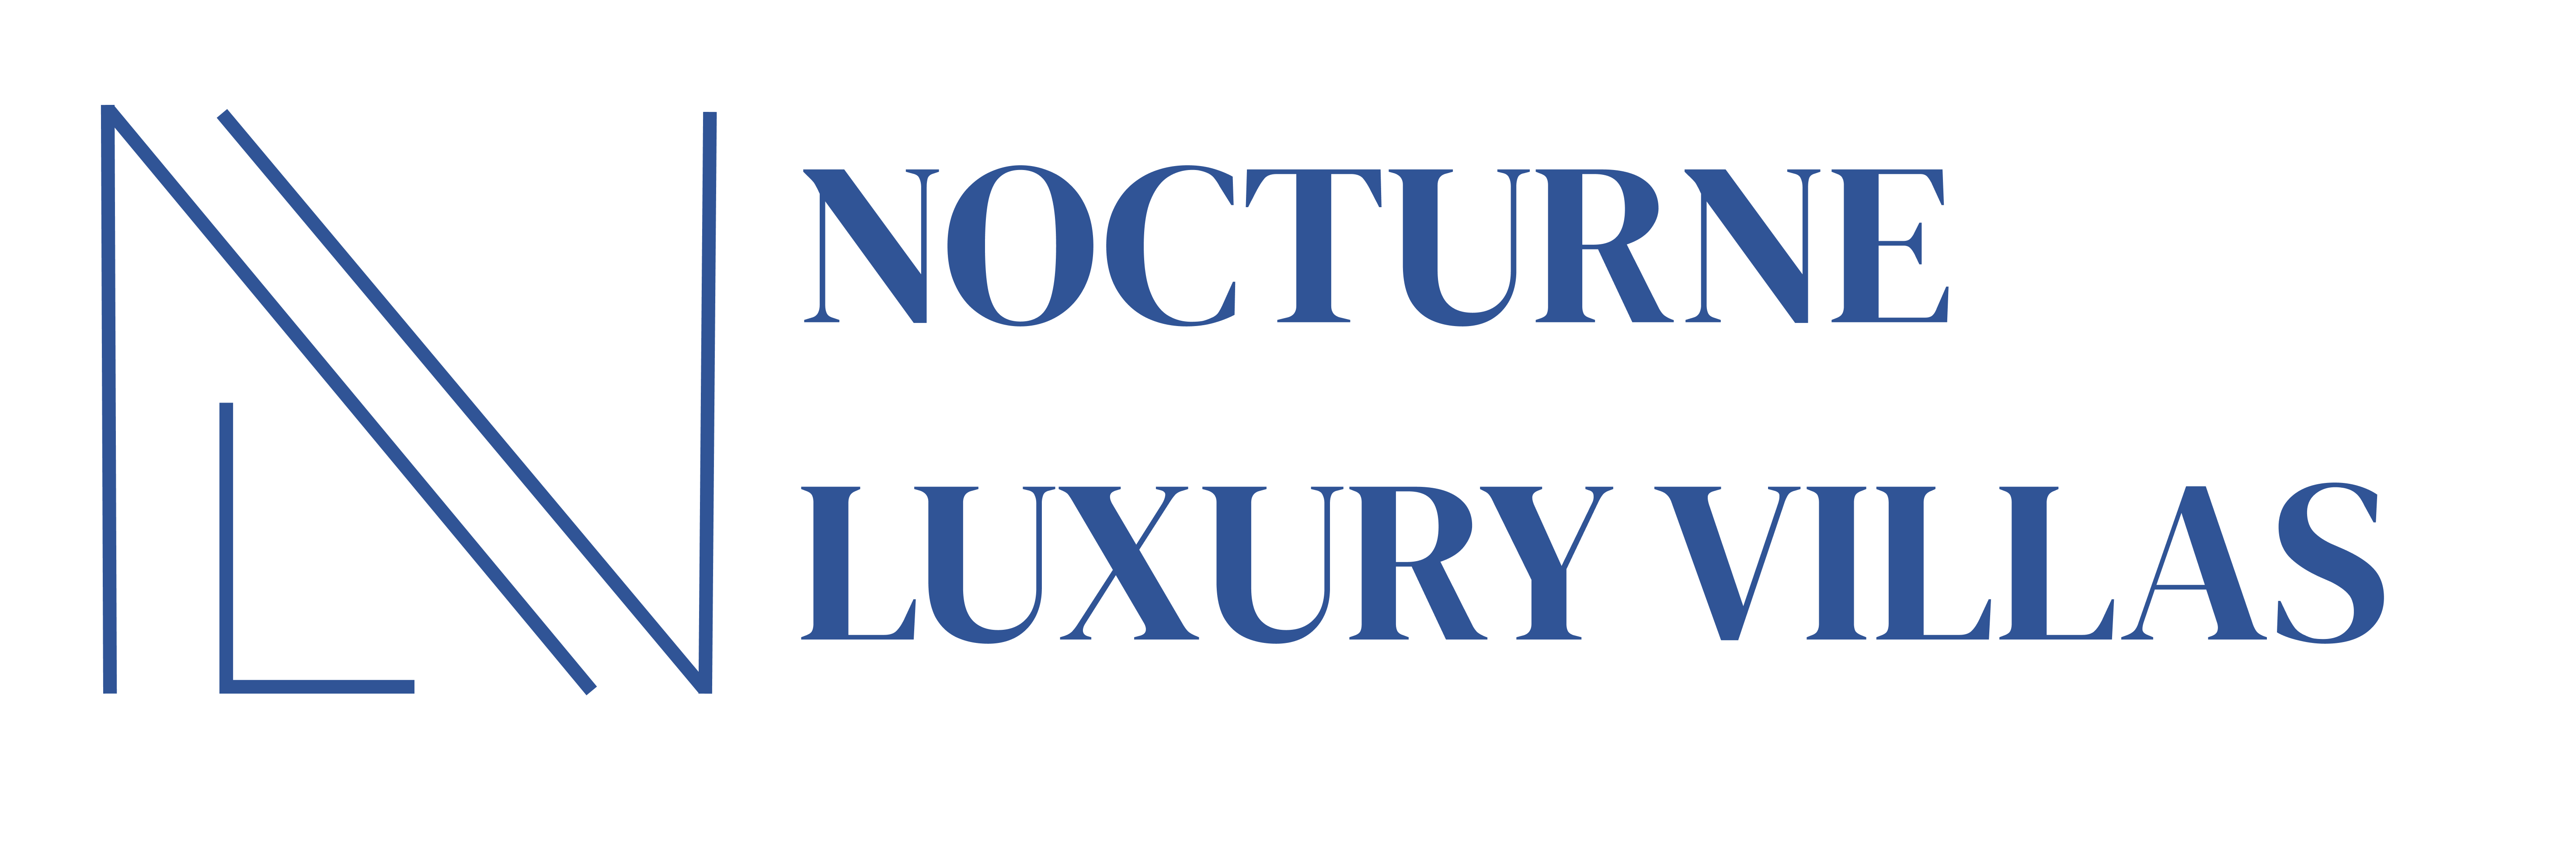 Nocturne Luxury Villas, Inc.